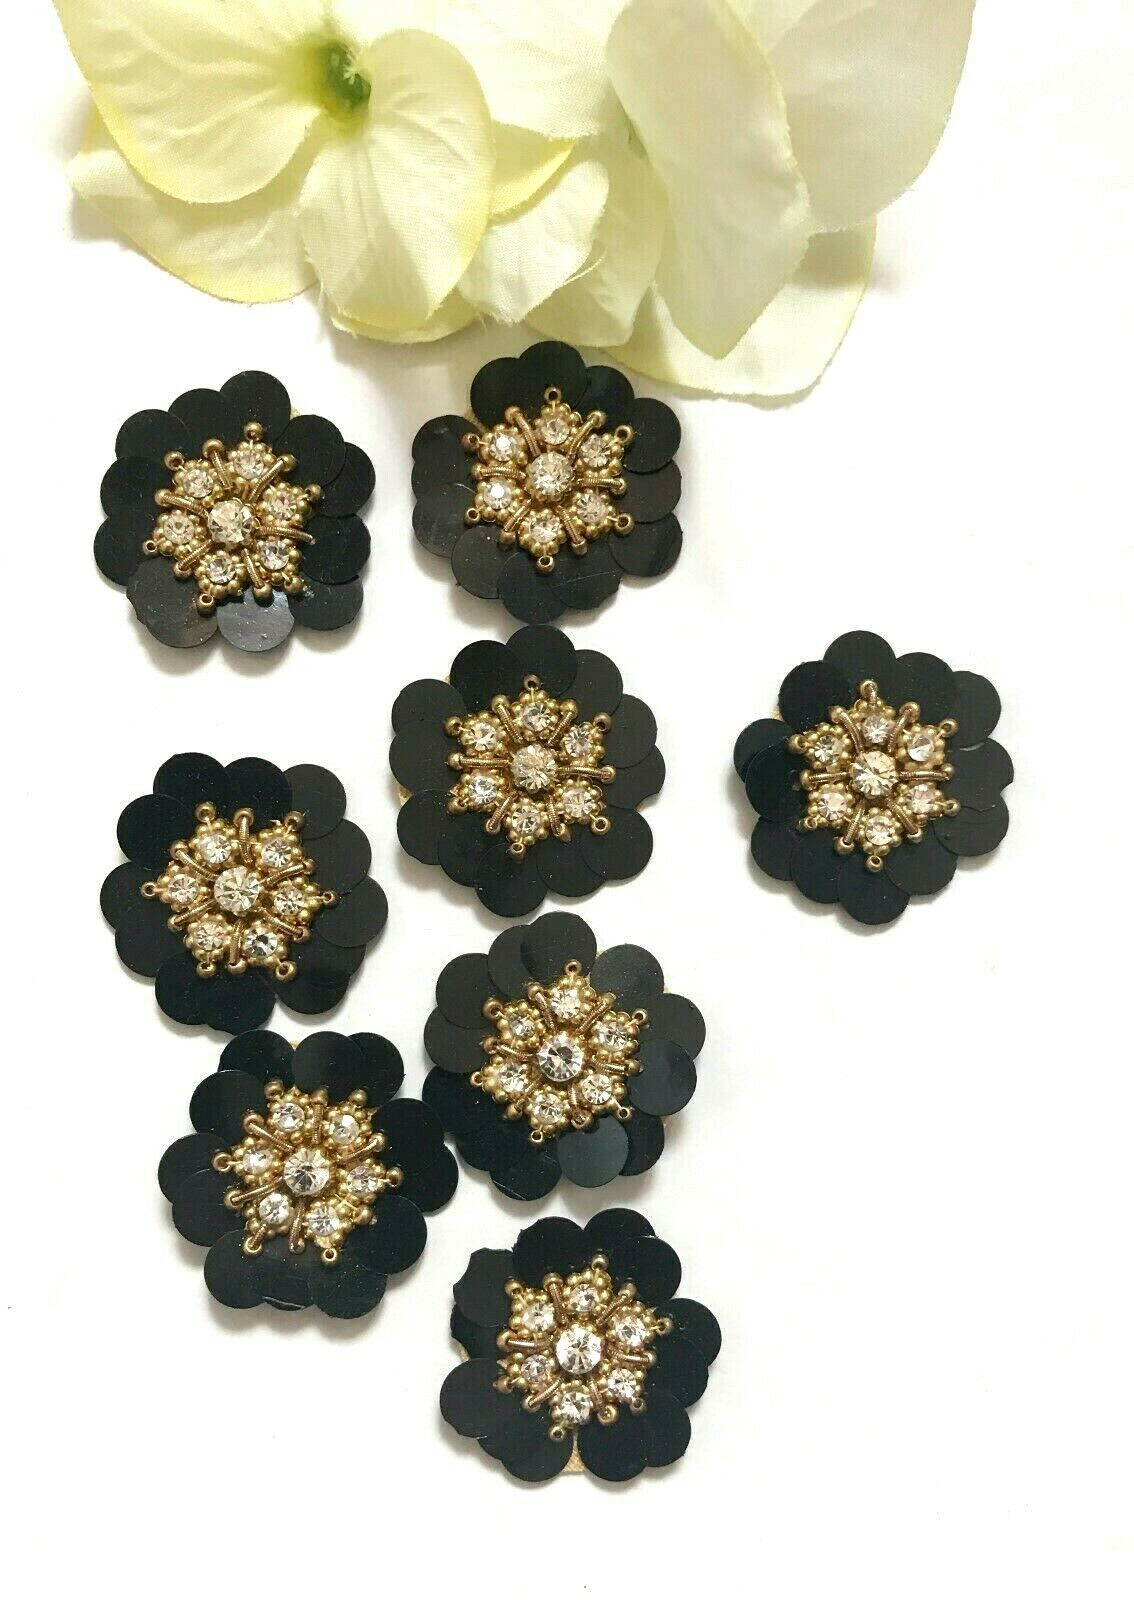 5 Pcs Latest Indian Round Black Flower Sequence Rhinestone zardosi Applique